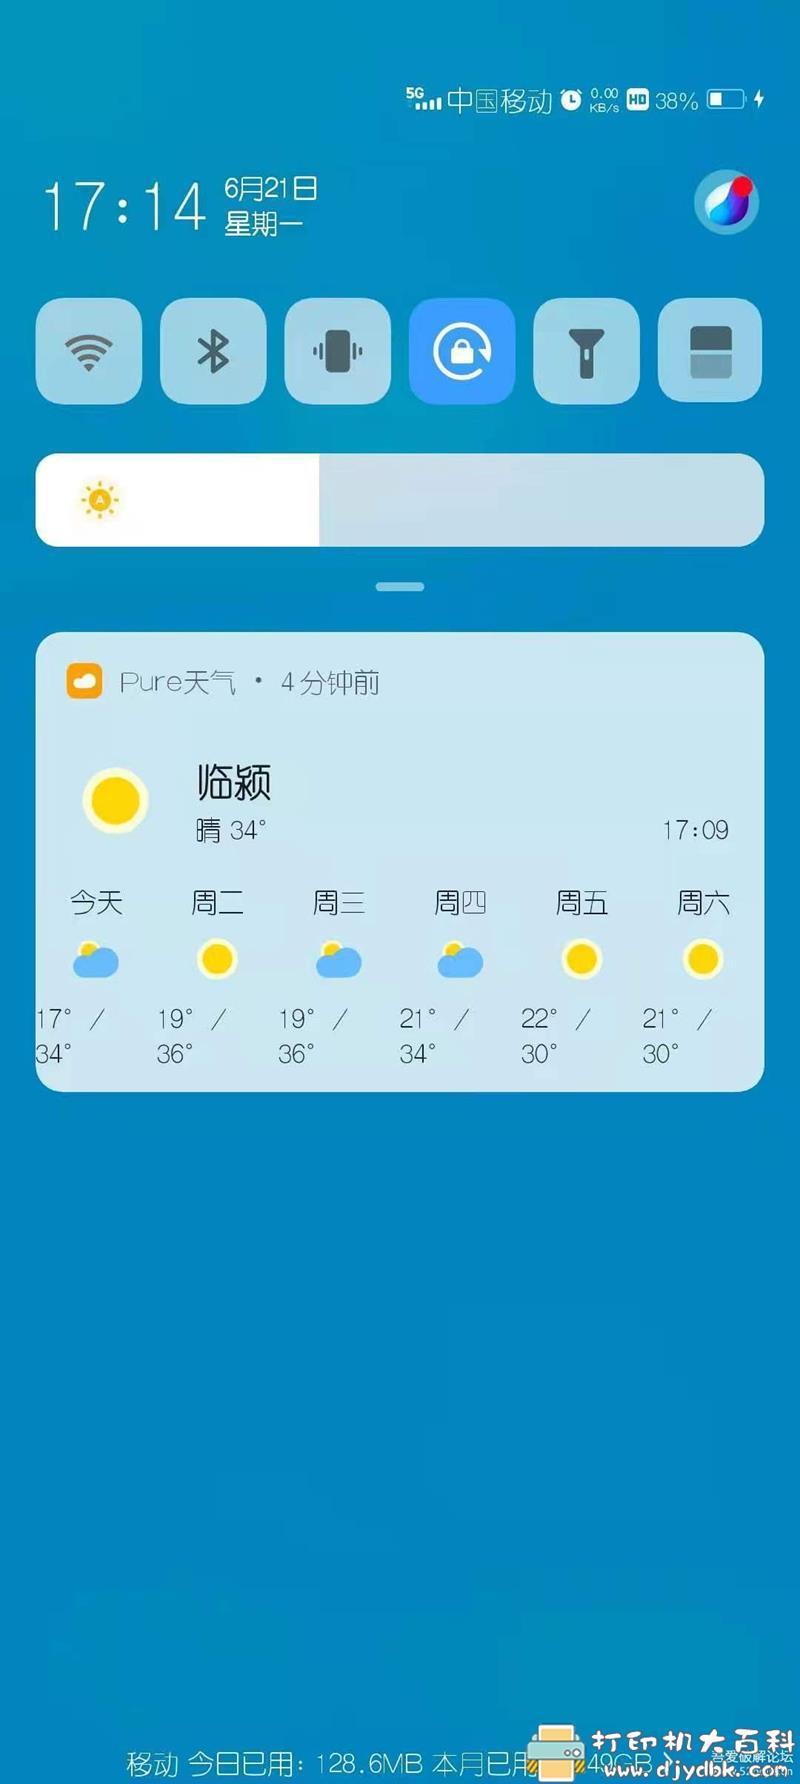 [Android]Pure天气v8.5.7 去除广告版 配图 No.2